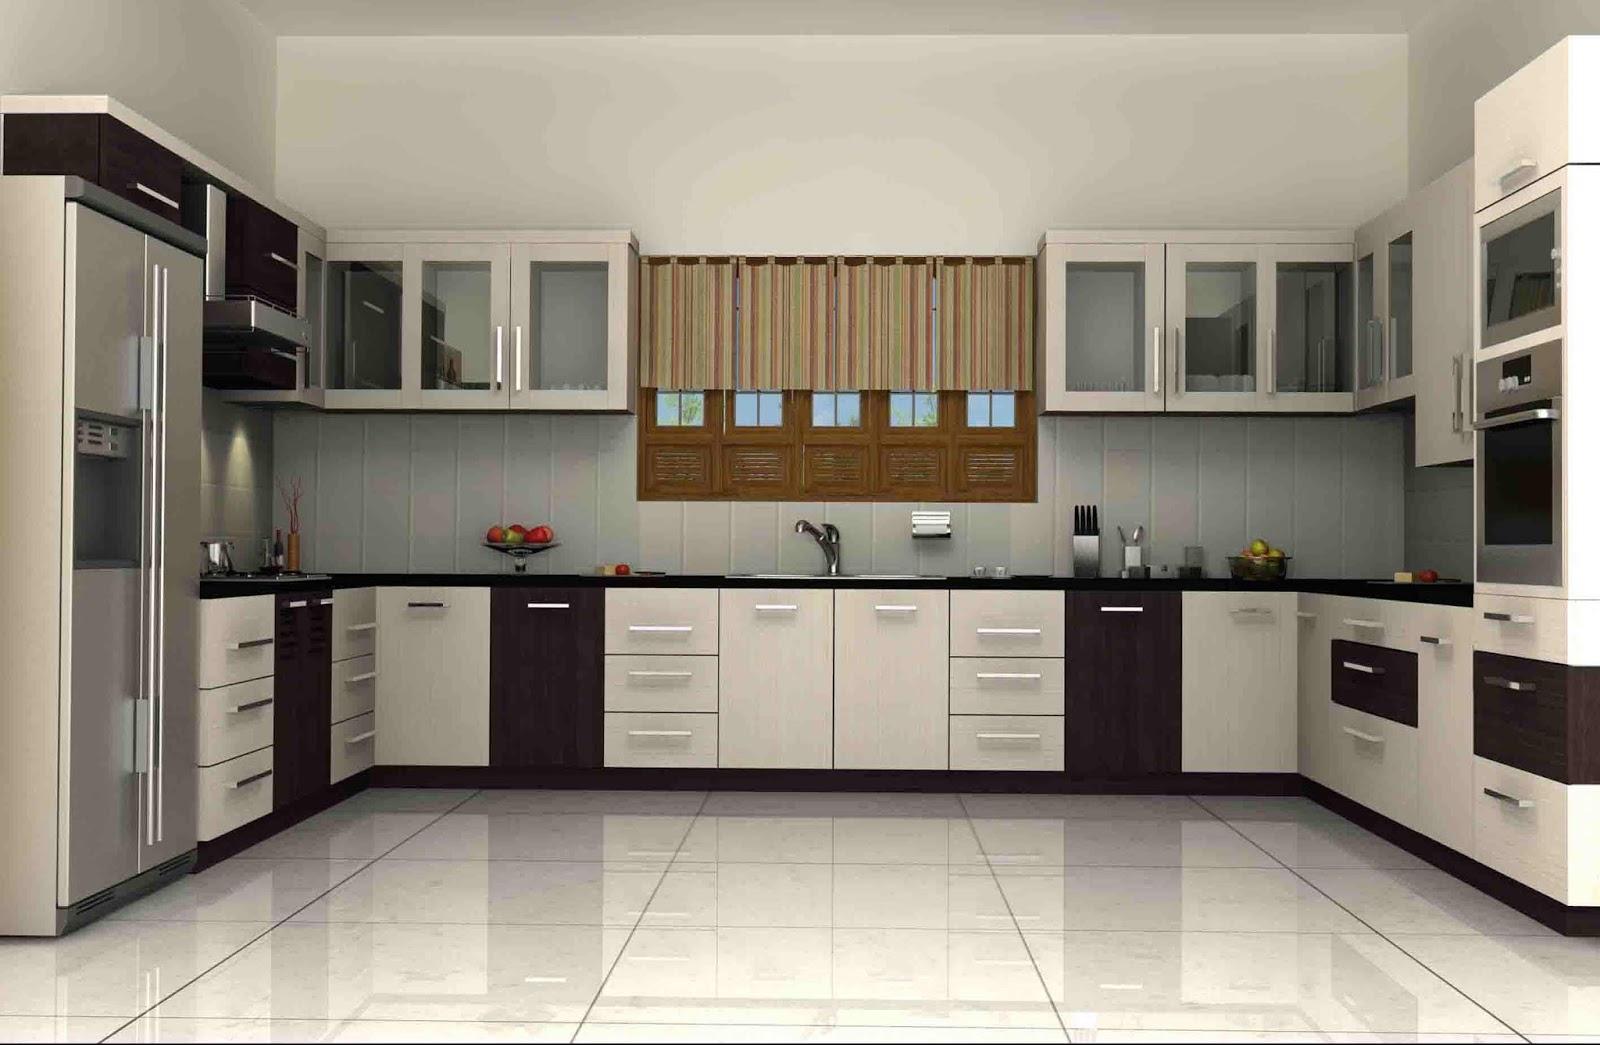 Uncategorized Best Kitchen Design App best kitchen design app felish home project app